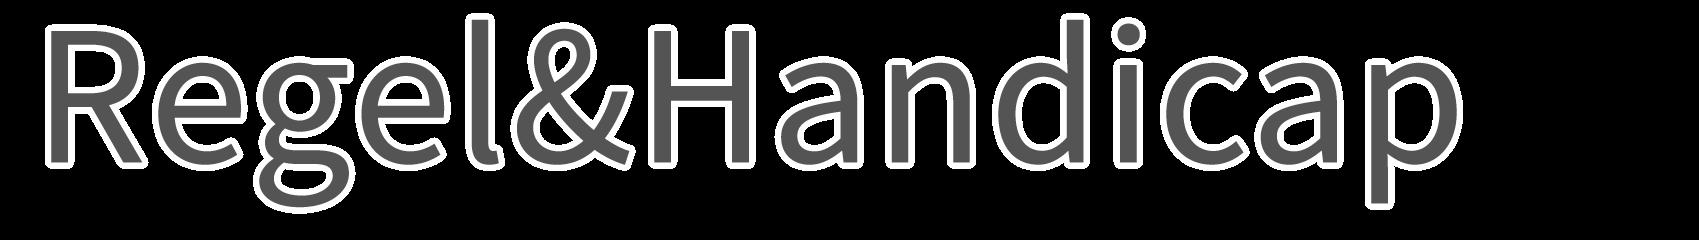 https://www.dezandvoortse.nl/wp-content/uploads/2021/03/RegelHandicap_Sectie_icon.png